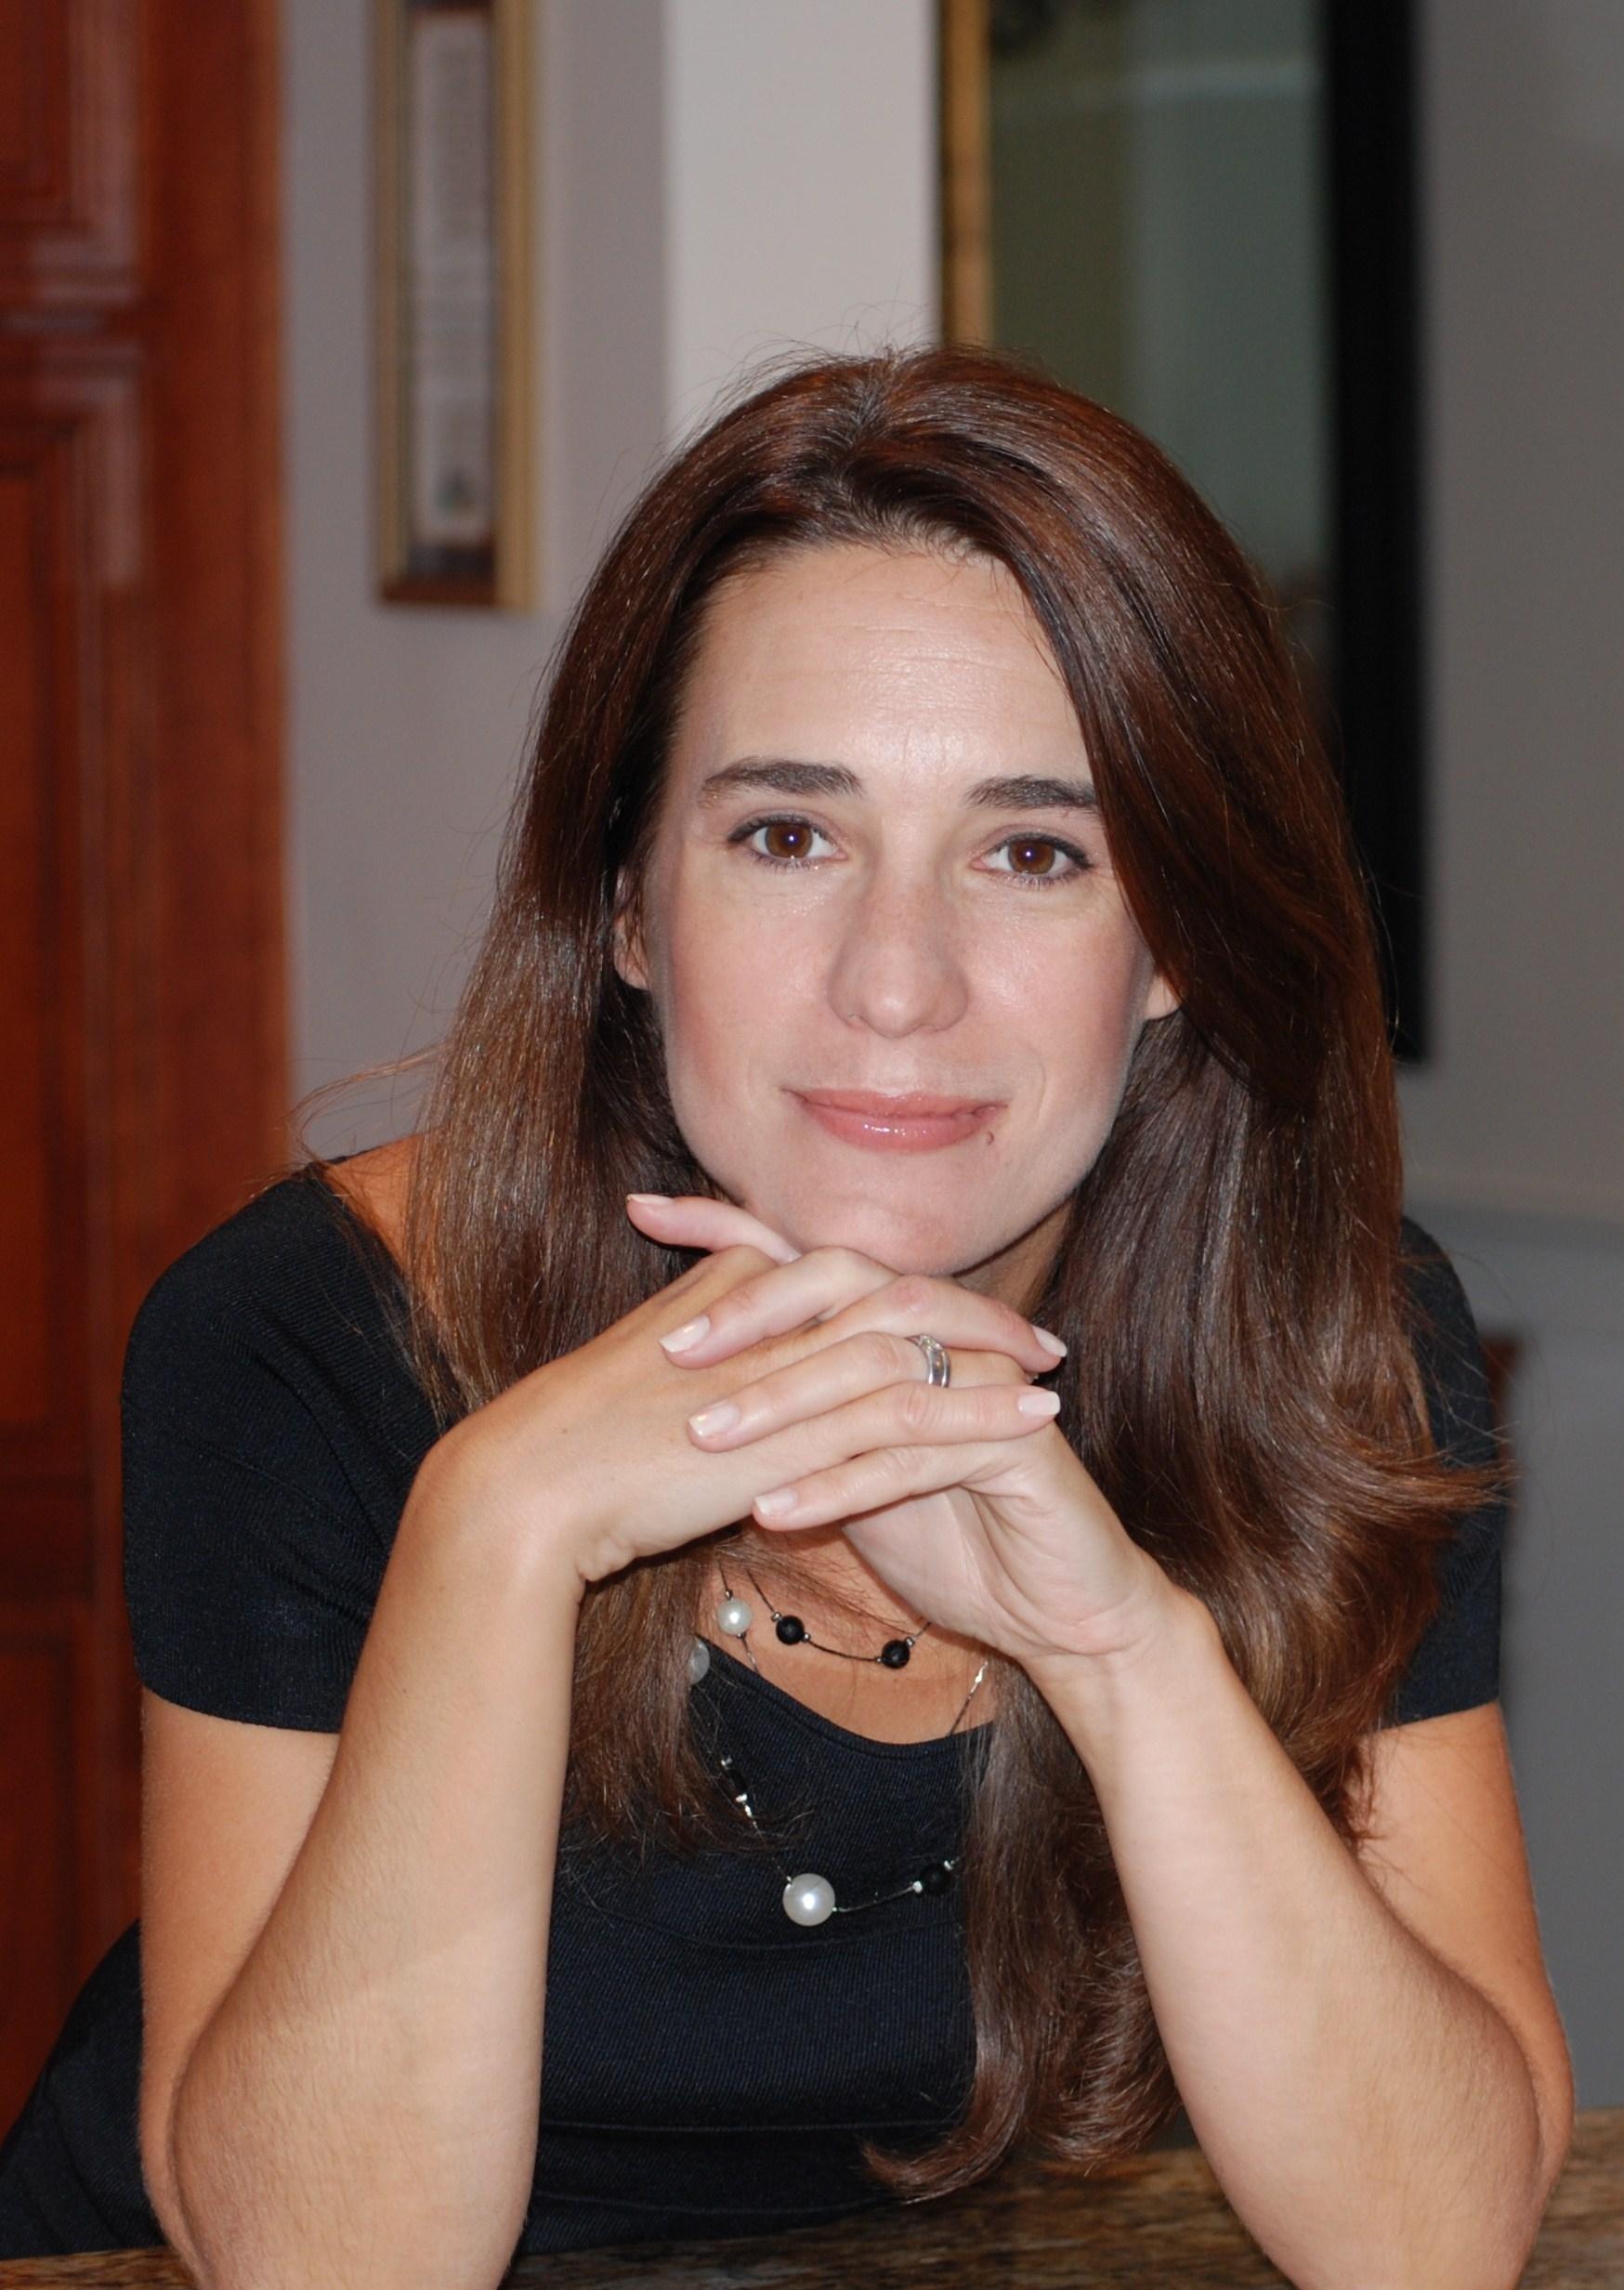 32d02219edcf7438fef3_Author_Panel_Myriam_Alvarez.JPG